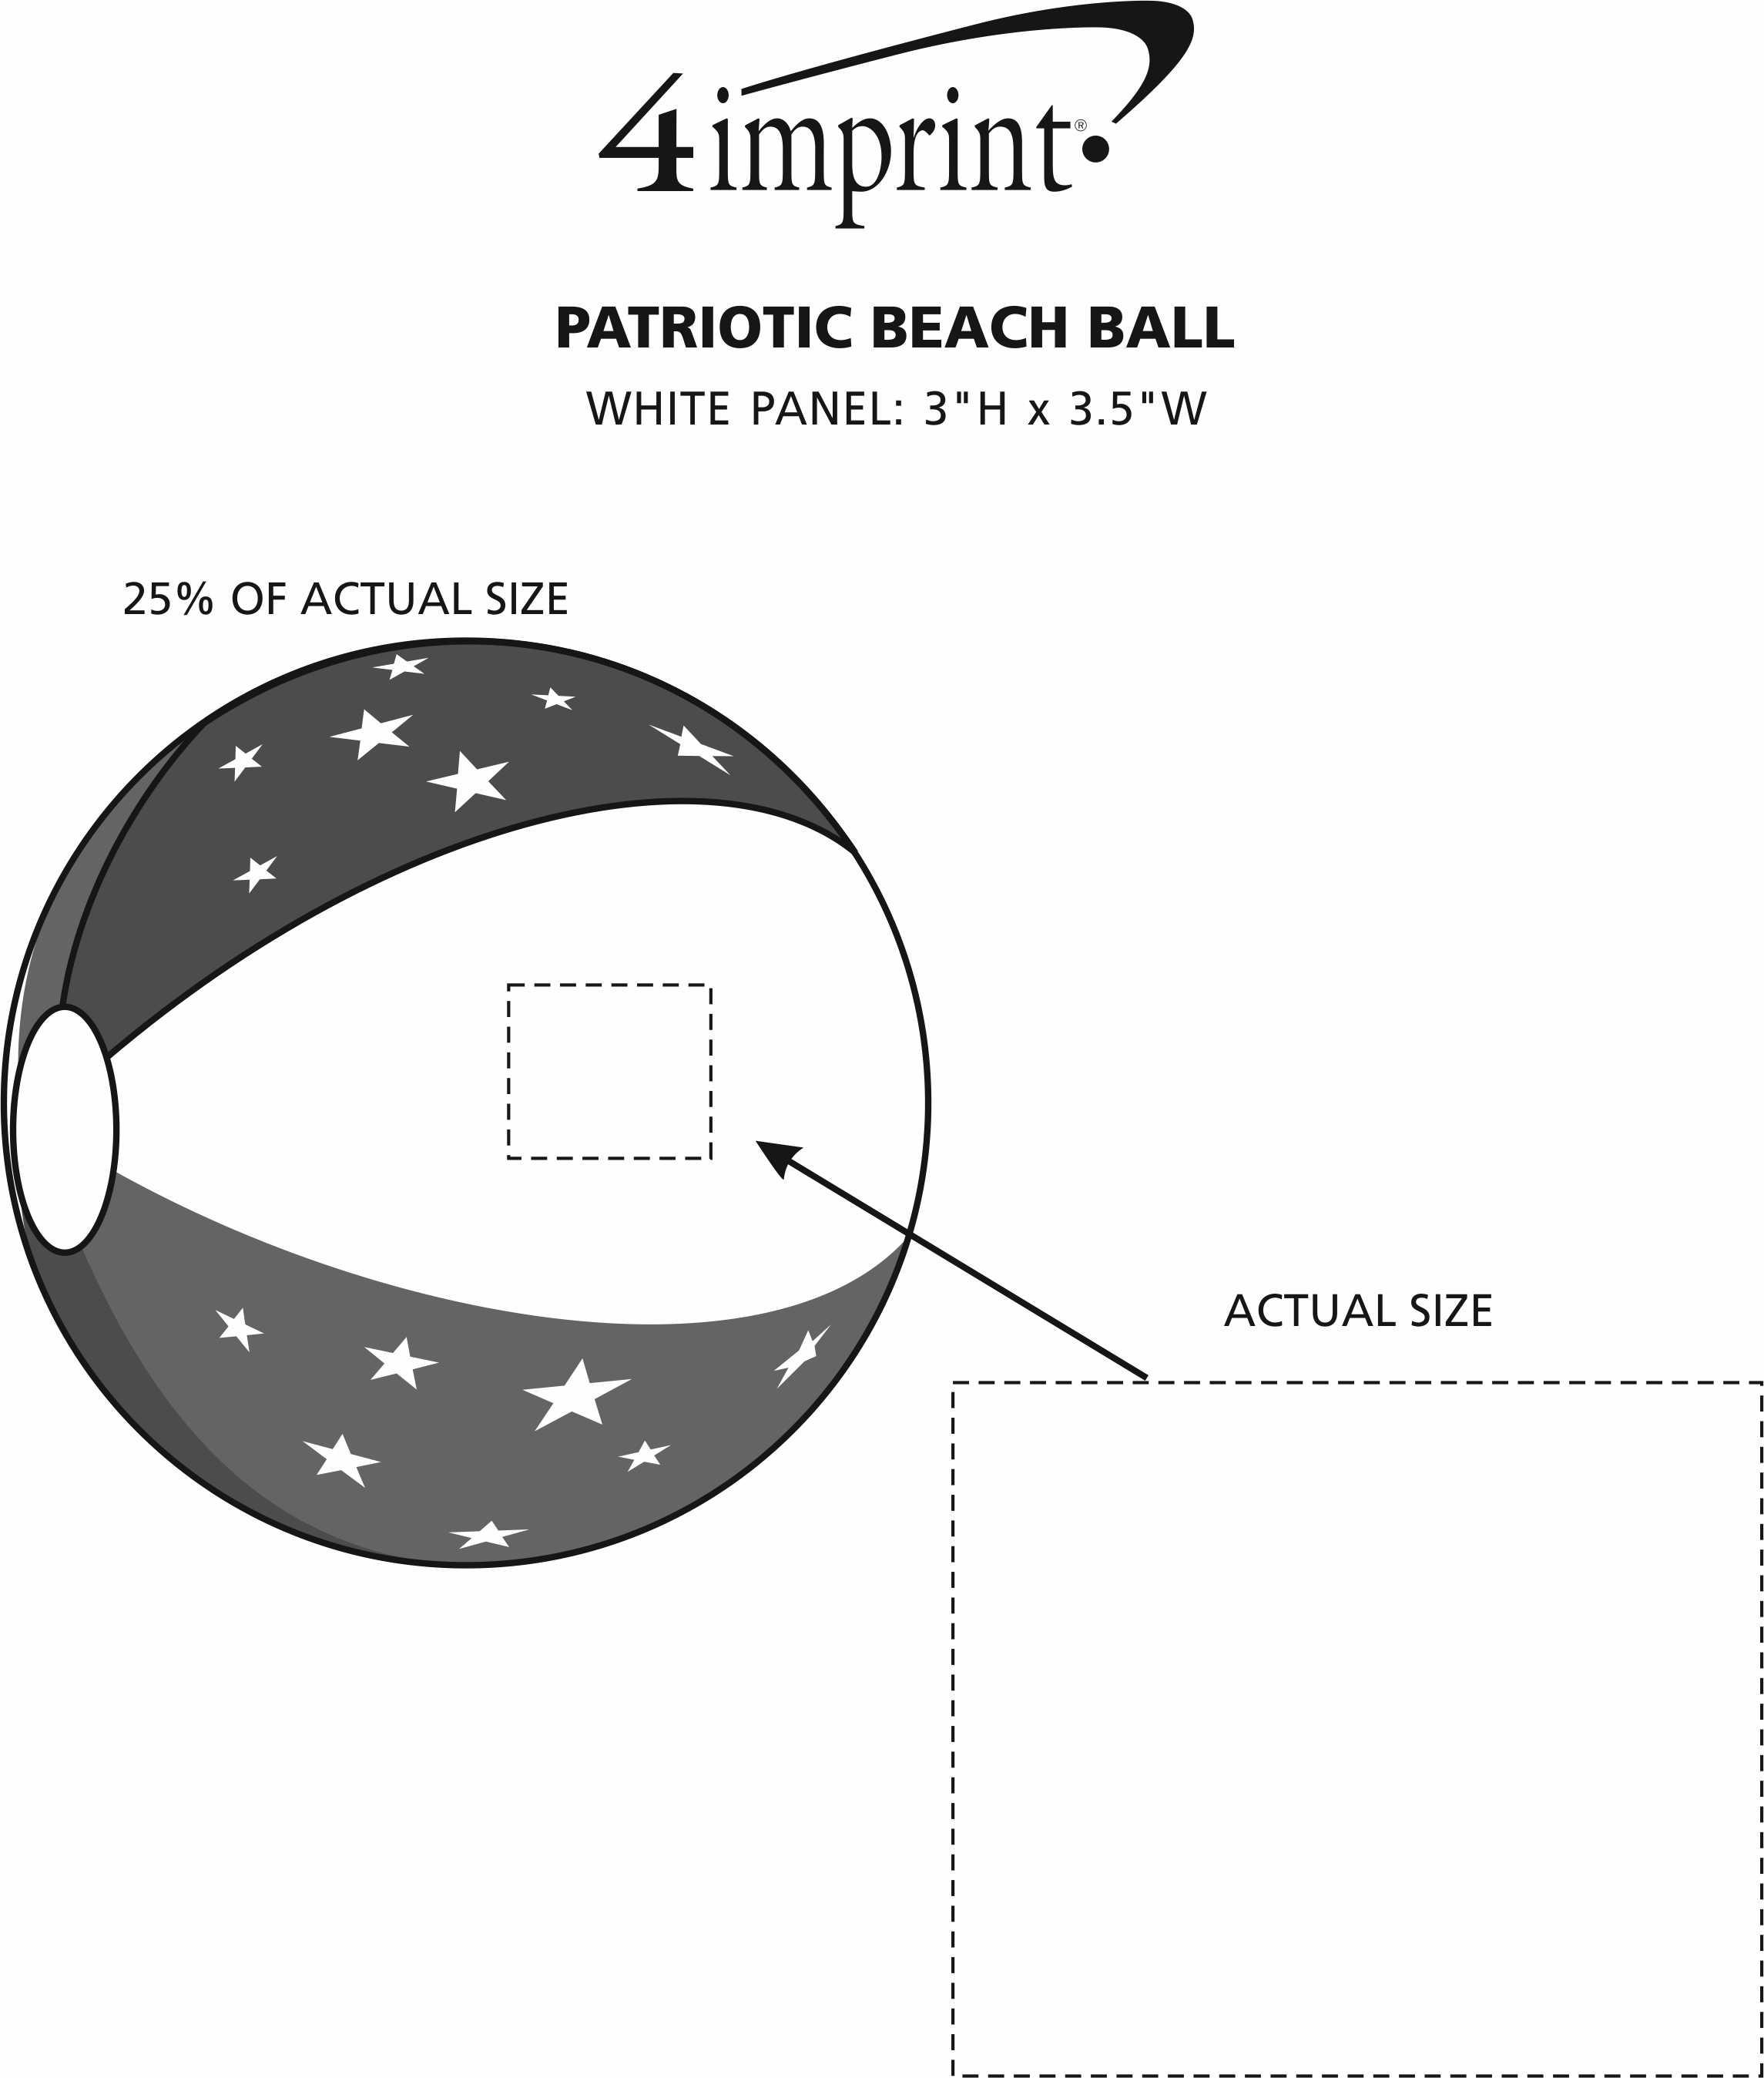 Imprint Area of Patriotic Beach Ball